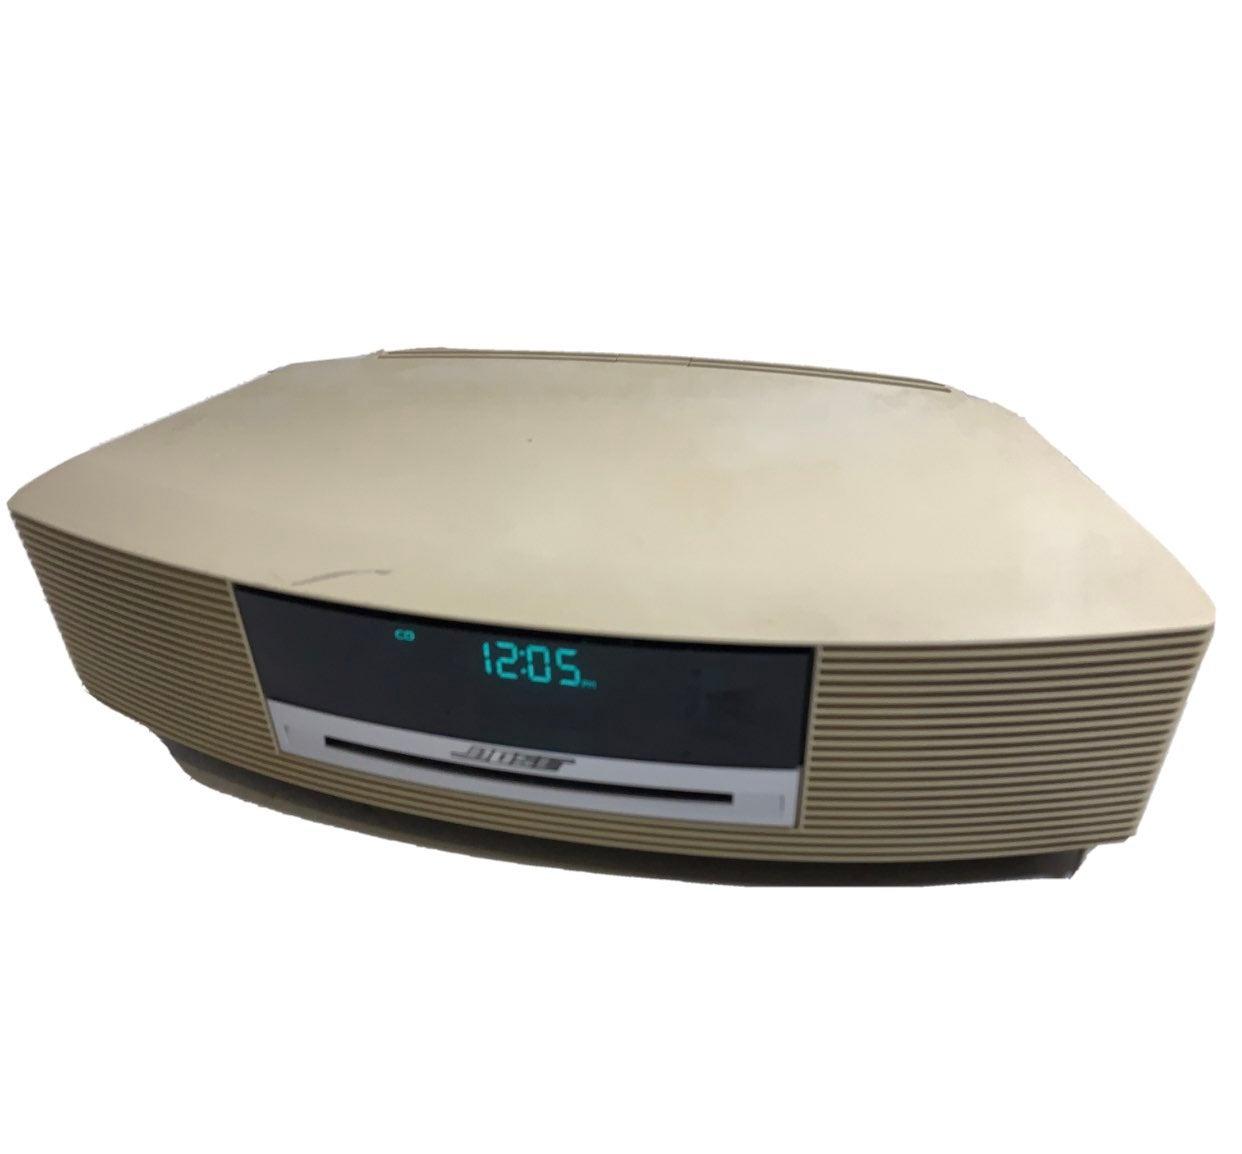 BOSE Wave Music System AWRCC2 *Defective